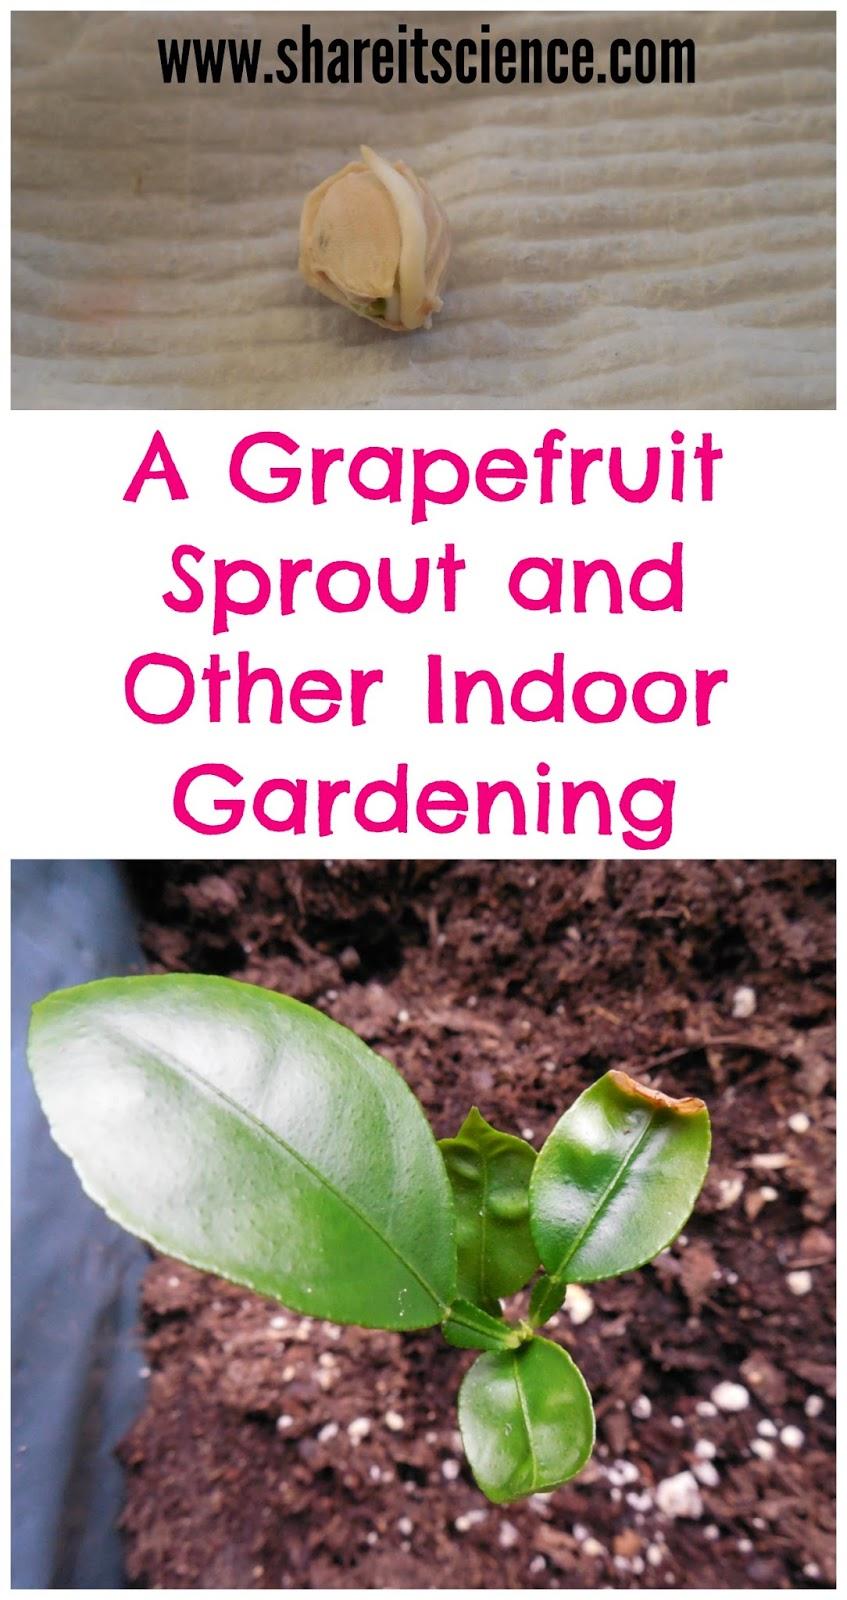 Kitchen Scrap Gardening Share It Science January 2015